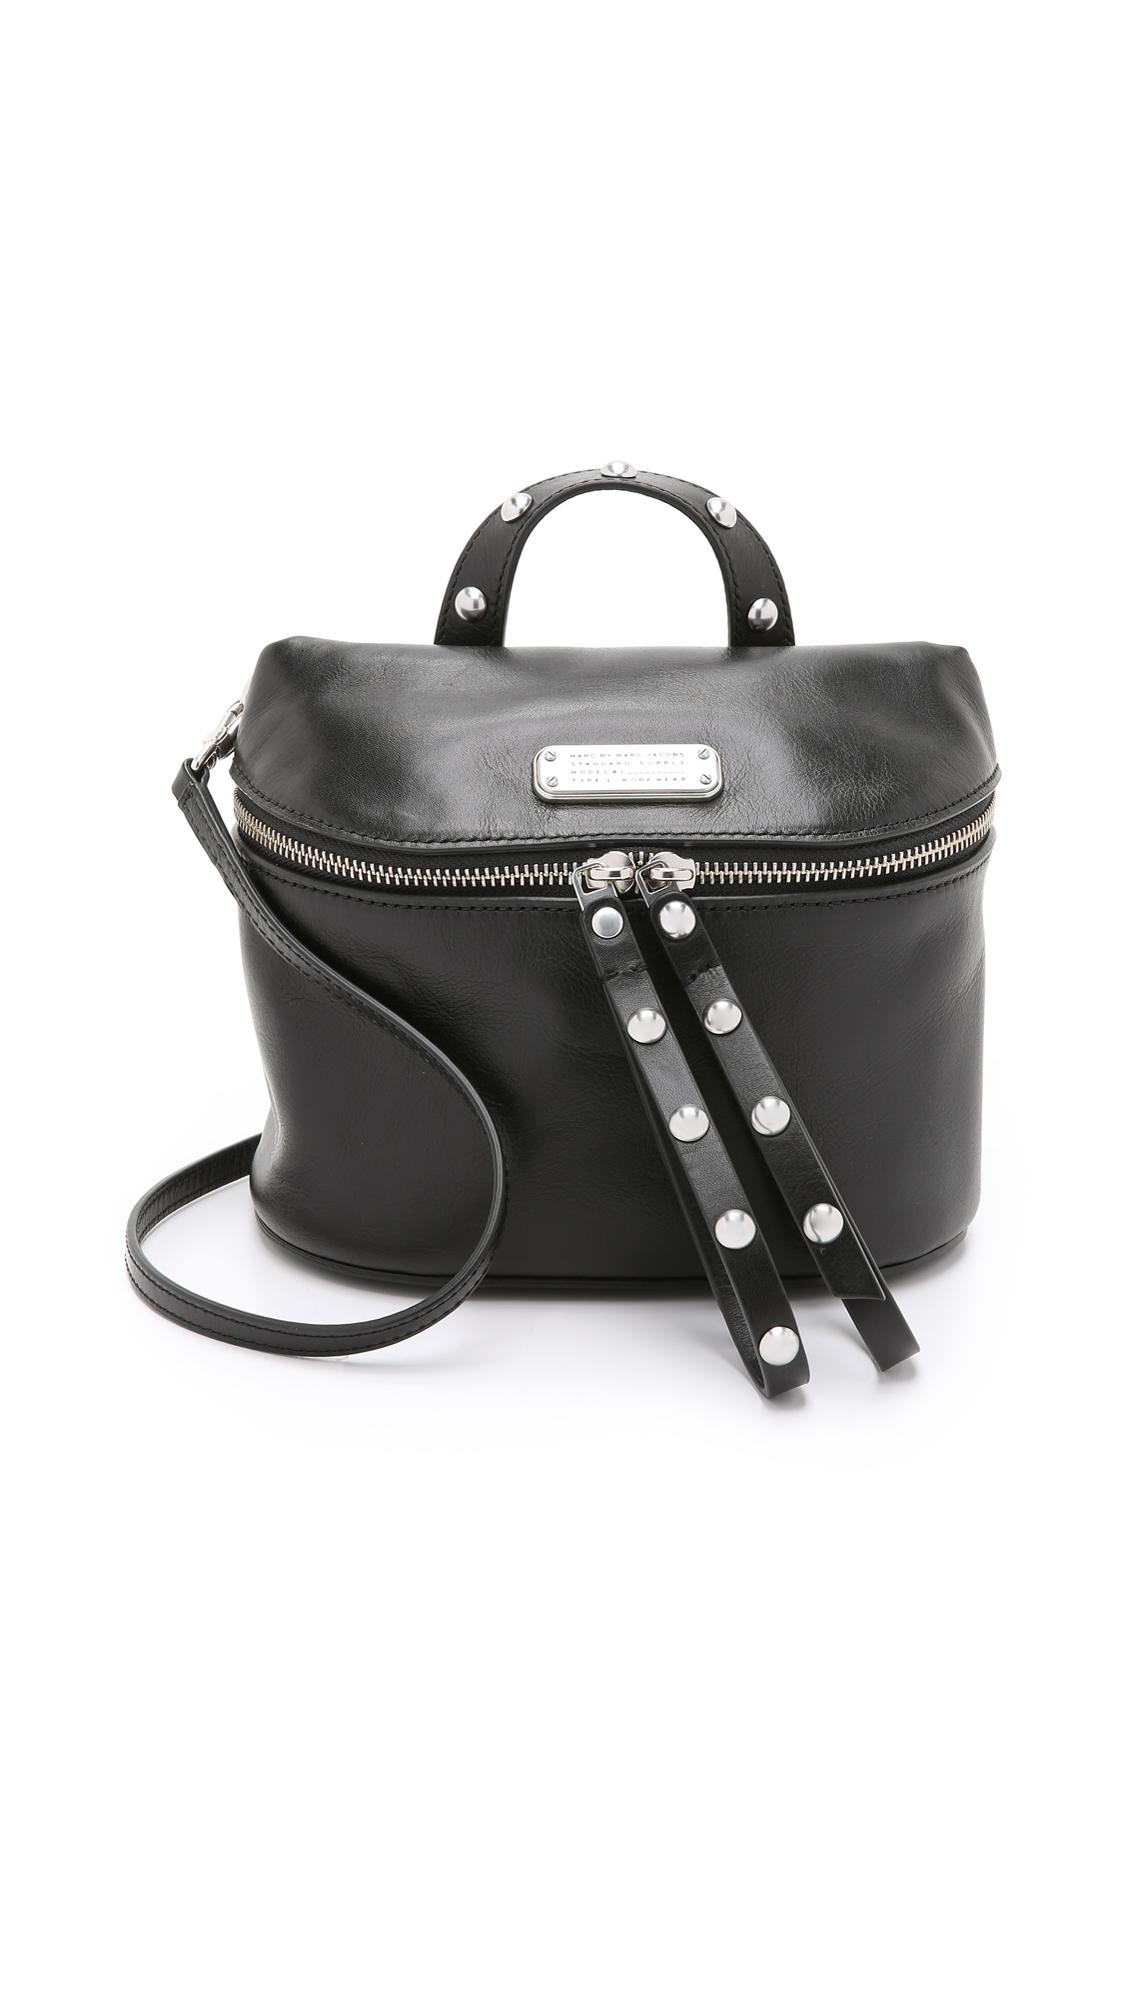 f2f1d8ff865a Lyst - Marc By Marc Jacobs Rivet Canteen Cross Body Bag - Black in Black